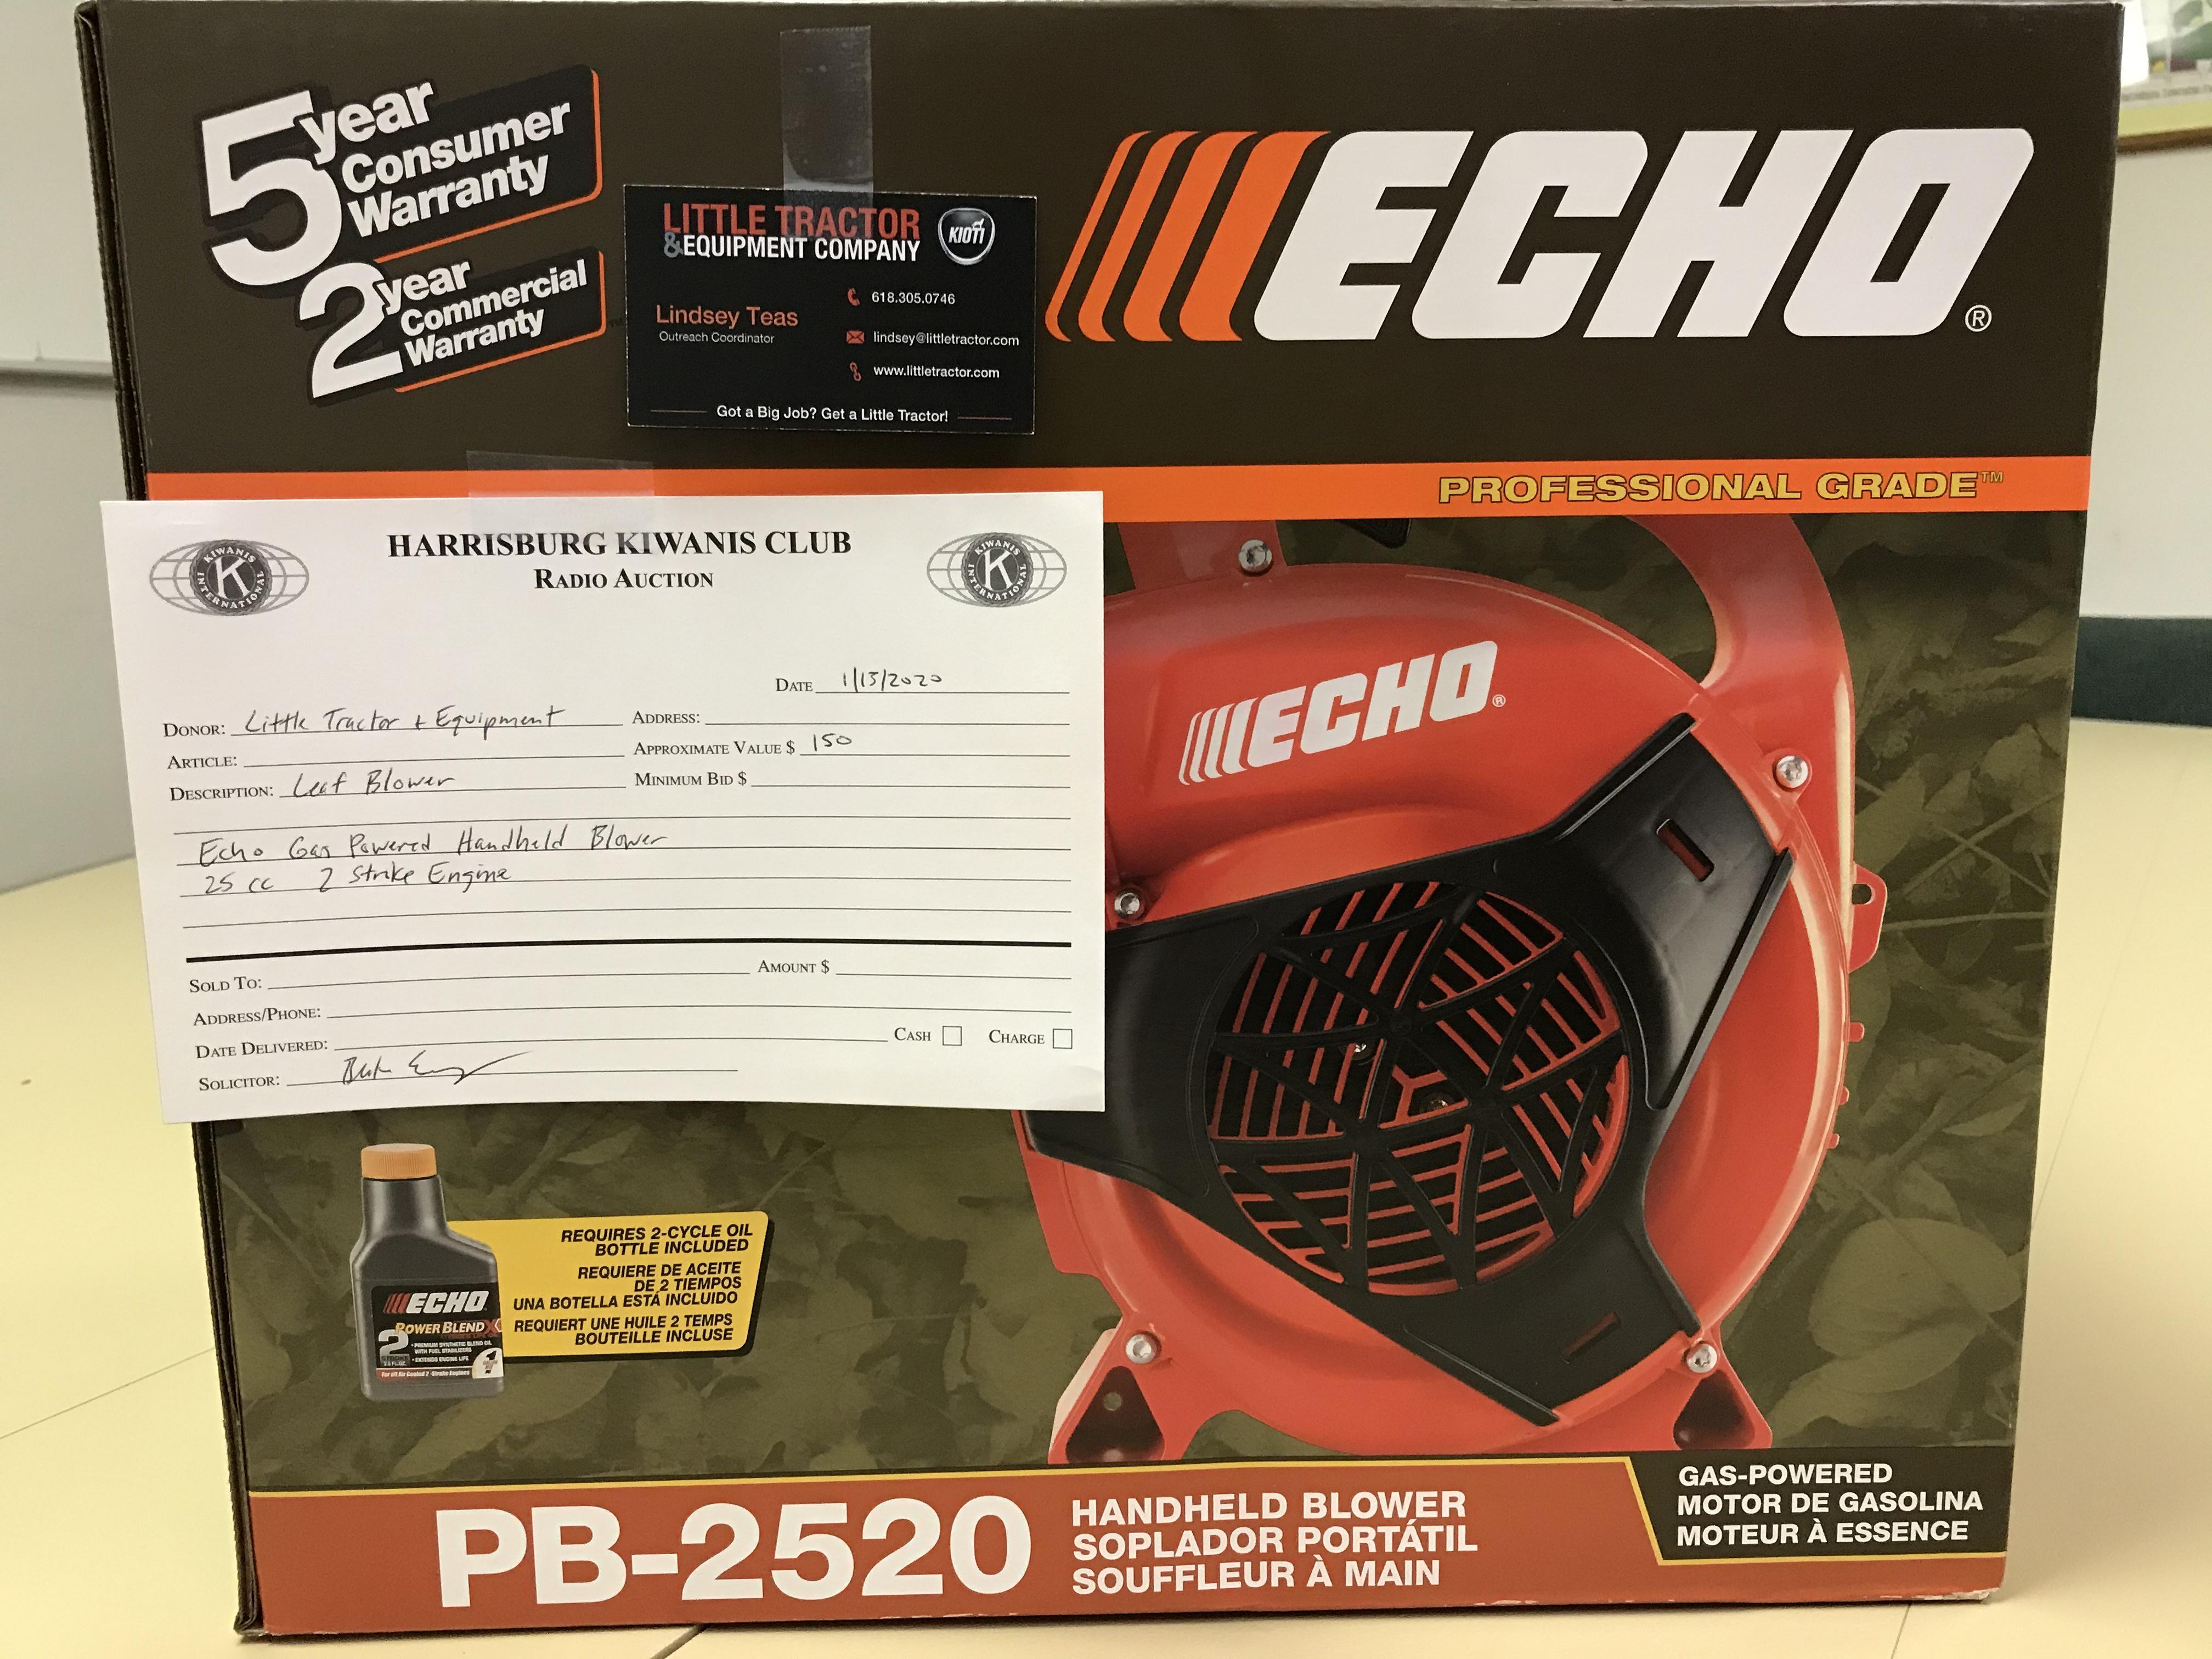 Item 434 - Little Tractor & Equipment Echo Gas Powered Handheld Blower